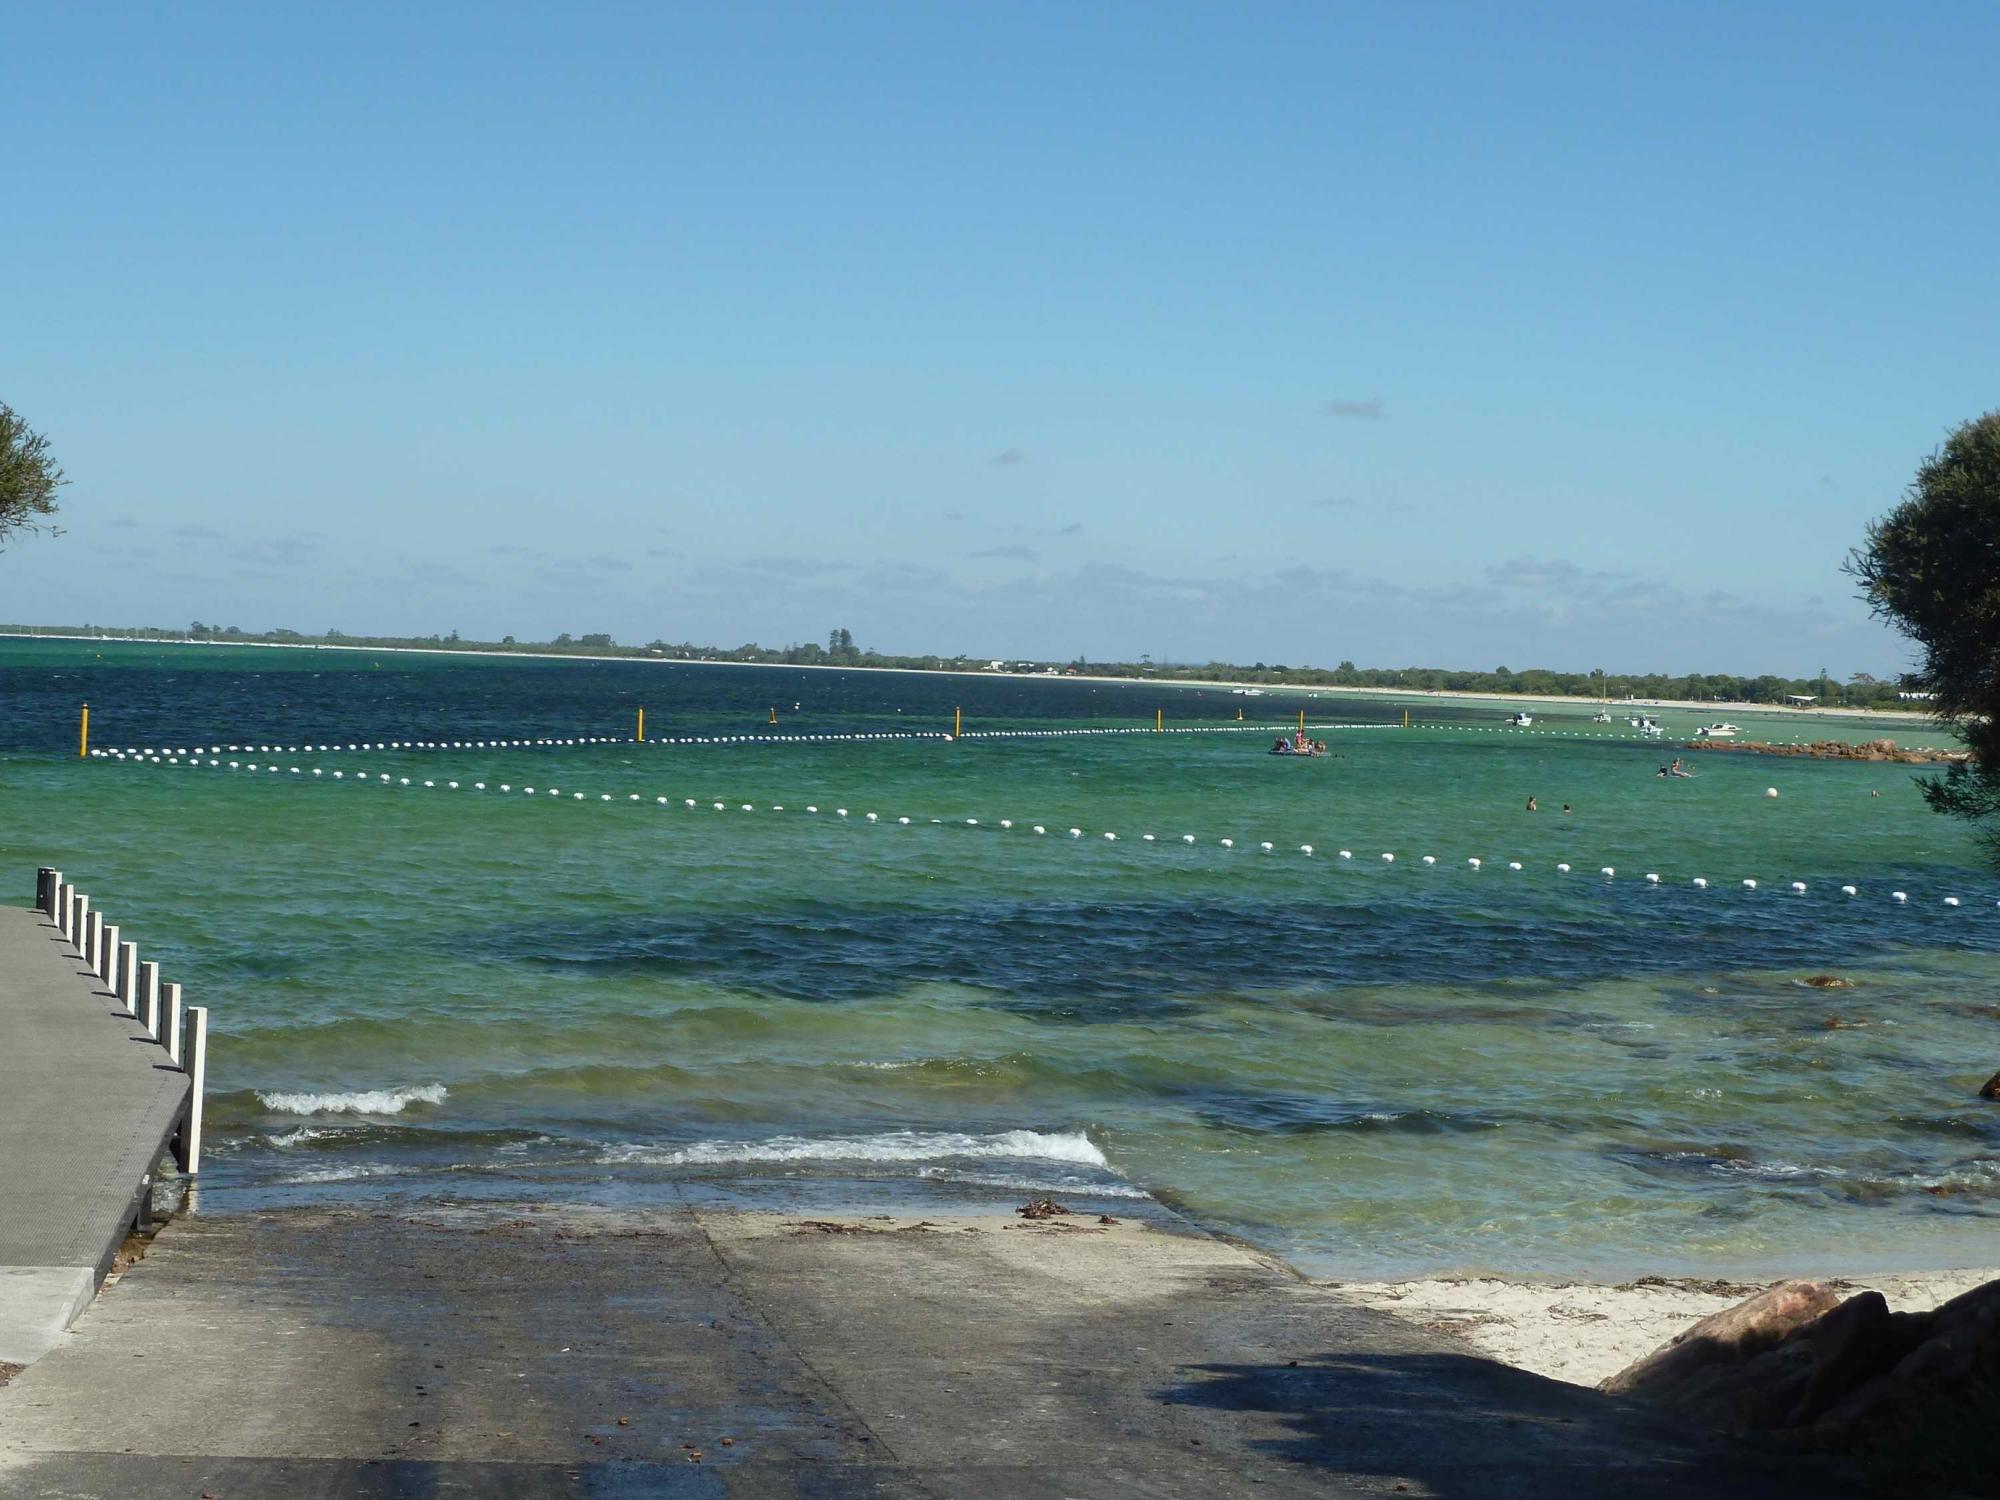 Shark nets in use